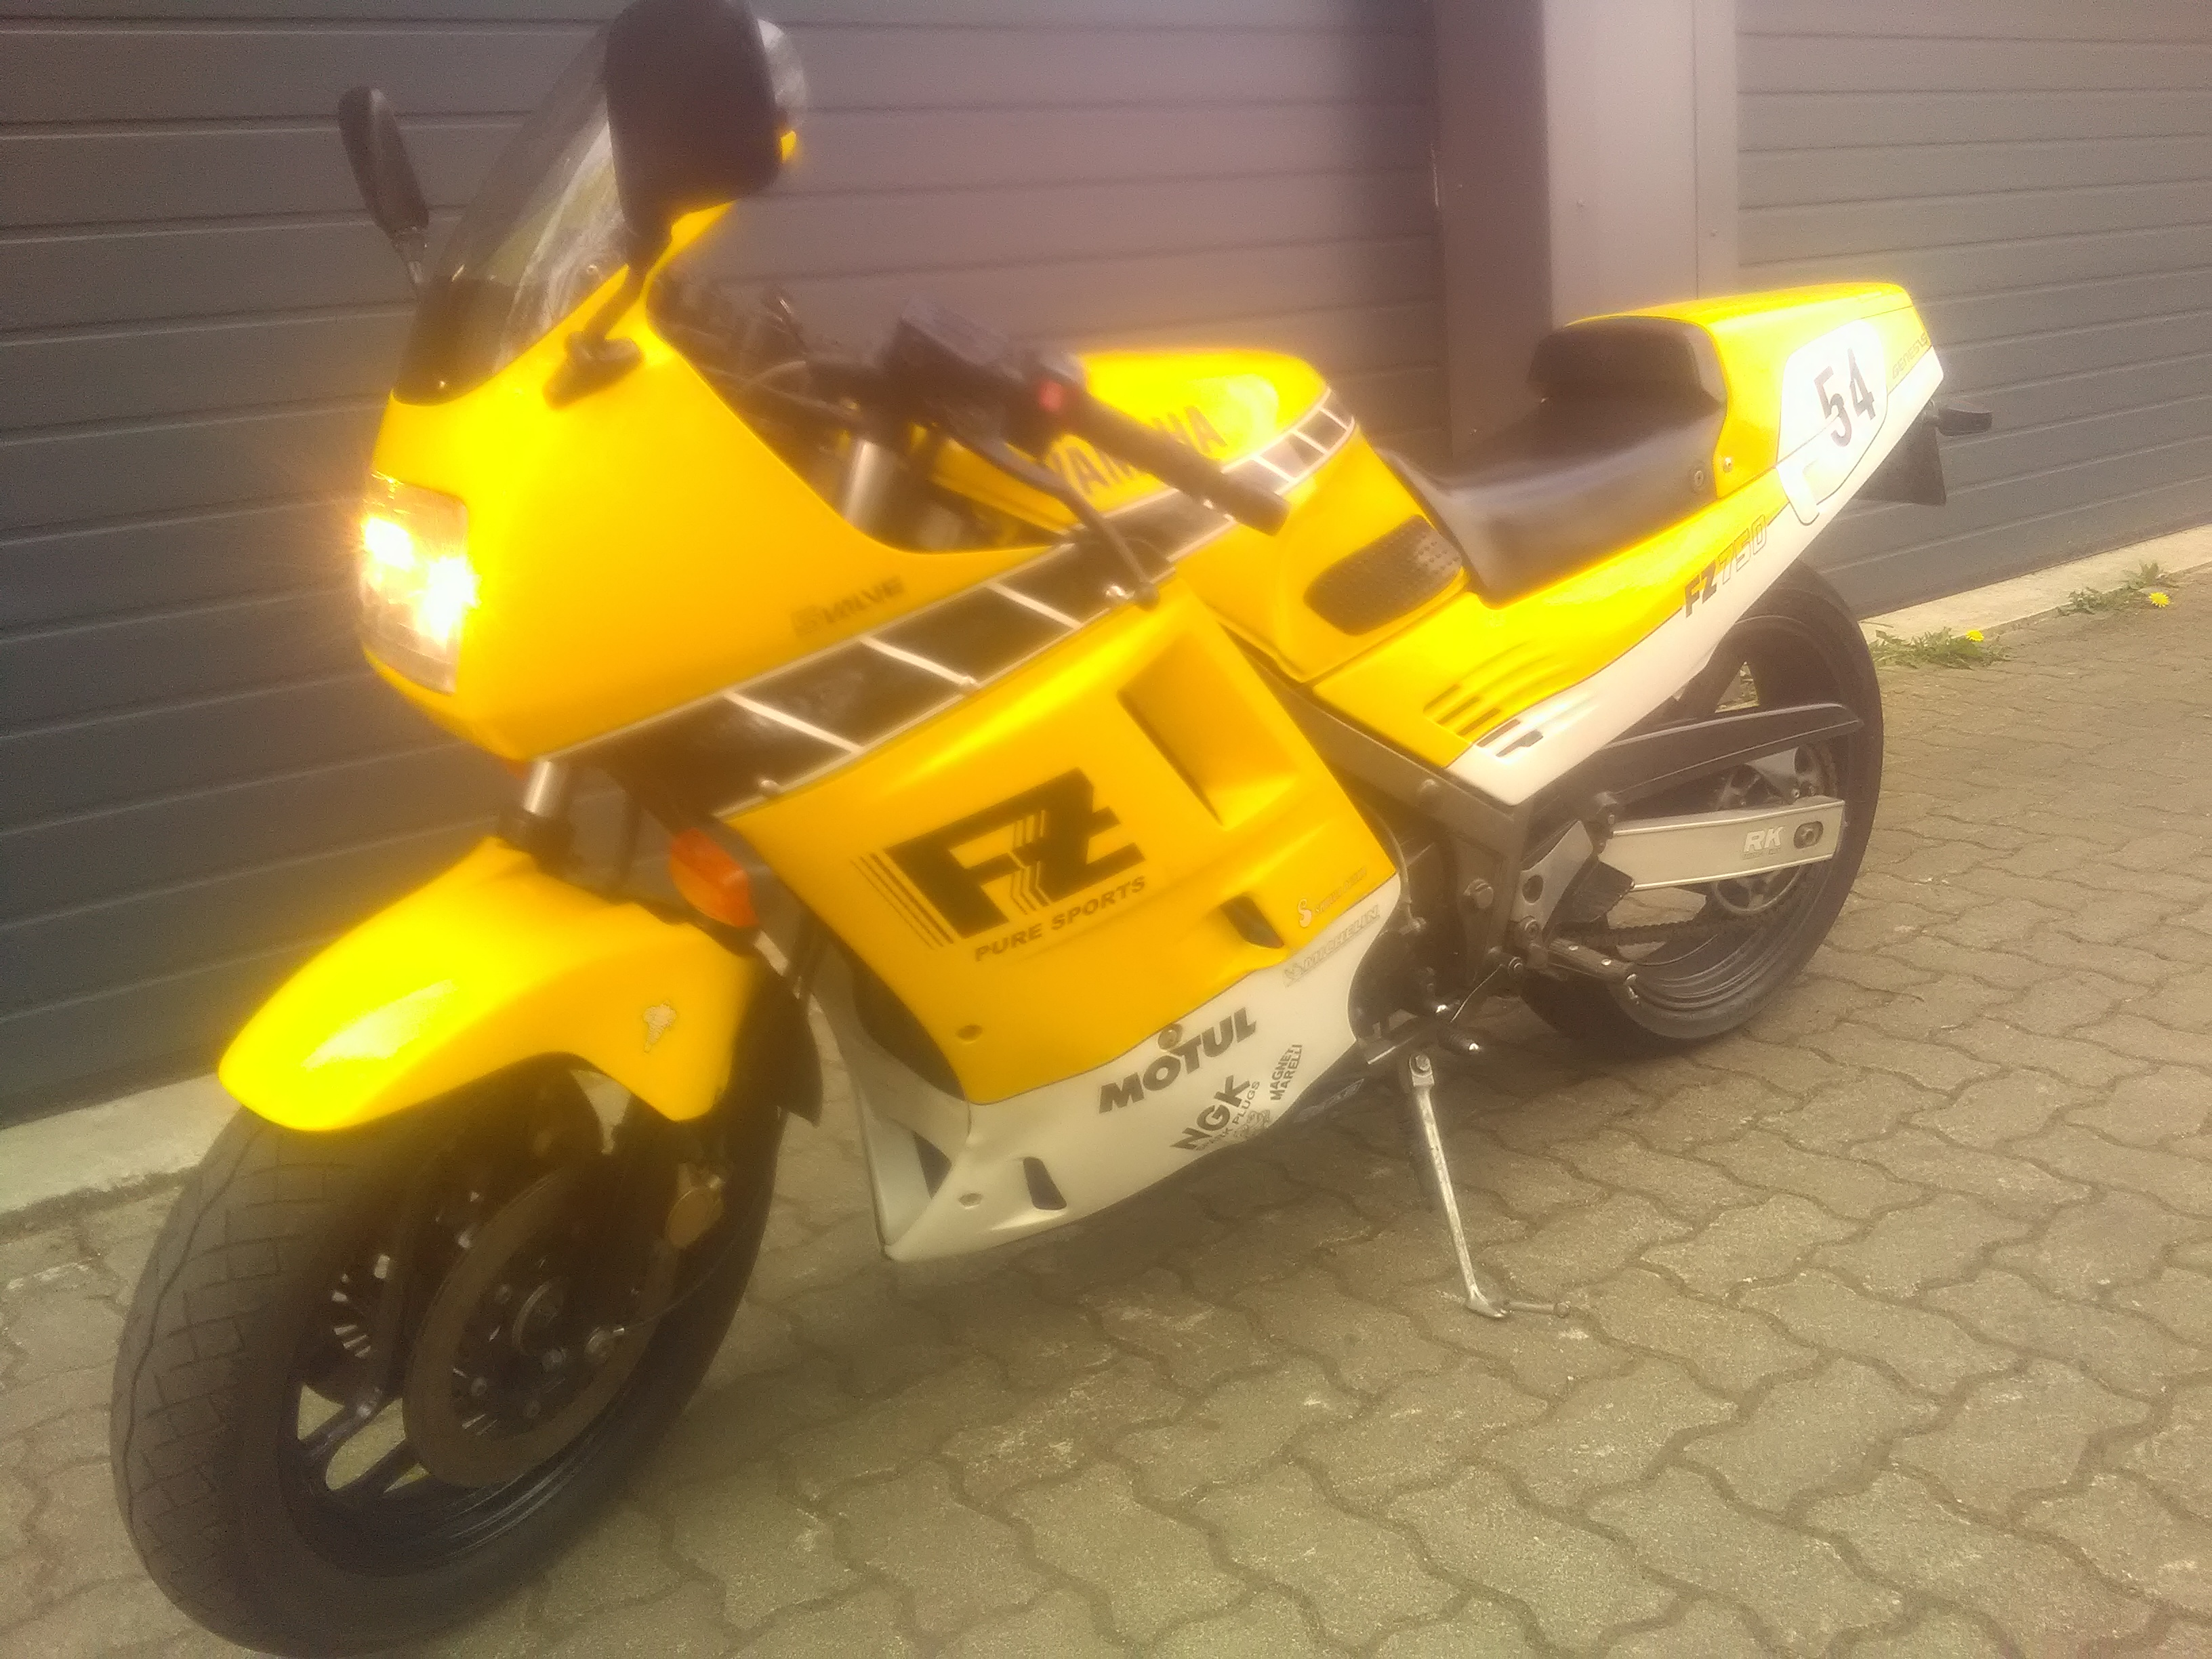 Yamaha FZ750 Kenny Roberts Replica.